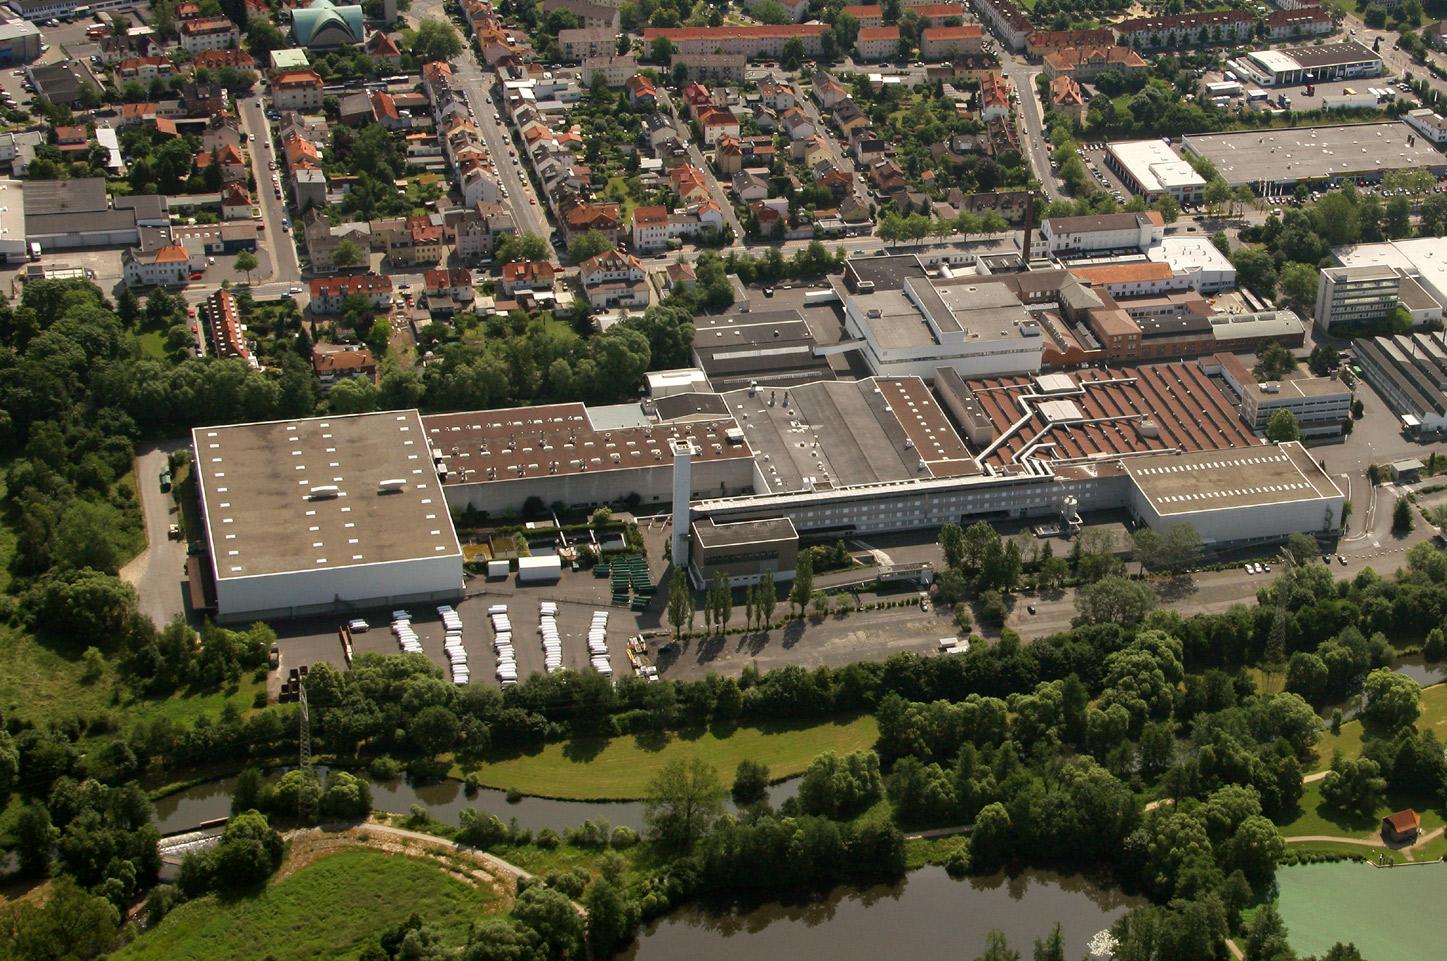 Luftbild-Filzfabrik-Fulda_web_header